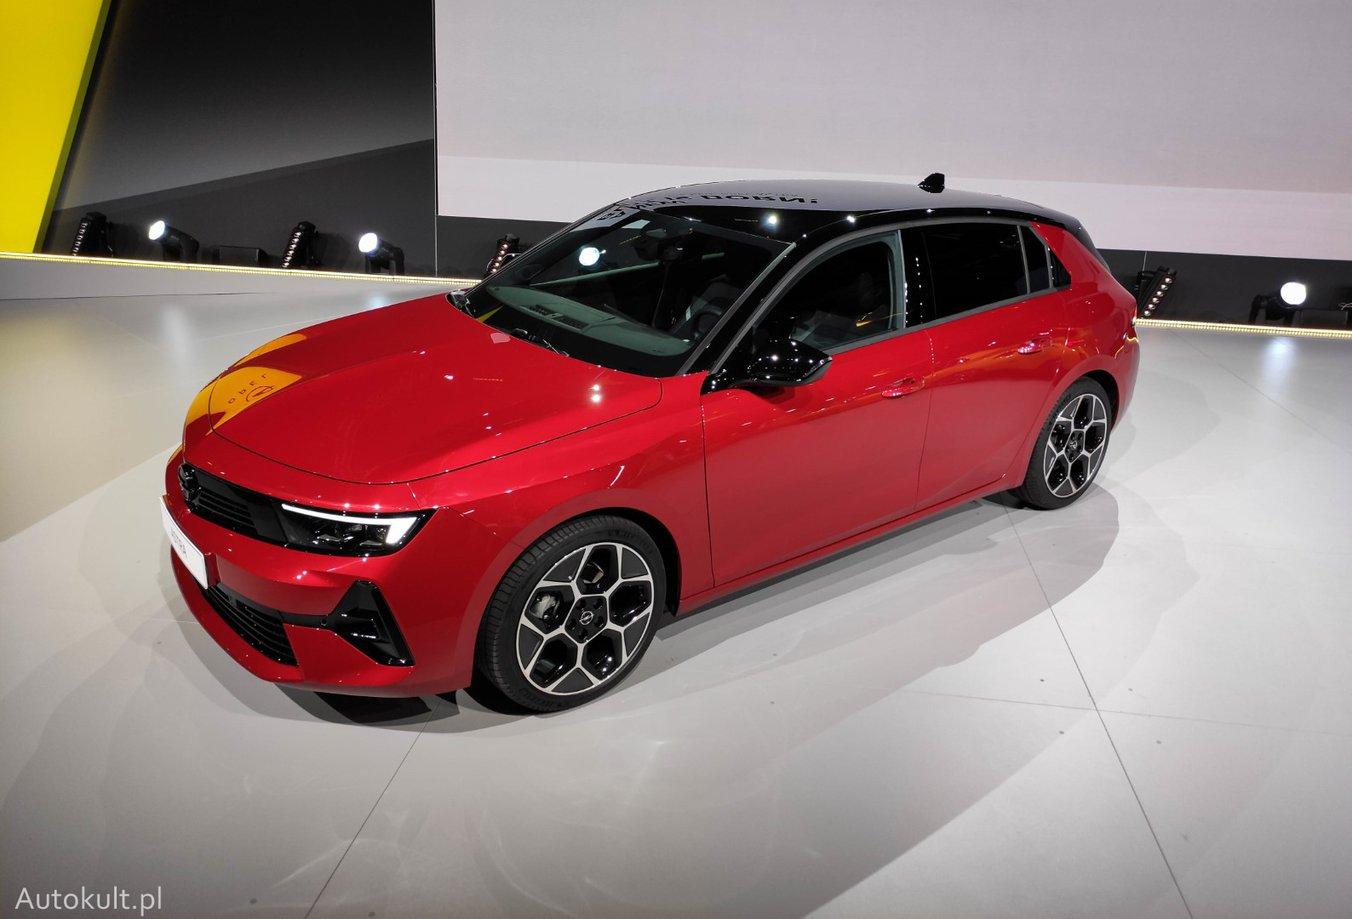 Re: 2021 - [Opel] Astra L [OV51/52] - Page 25 Img-20210901-144839-4cf4de2db817,0,920,0,0